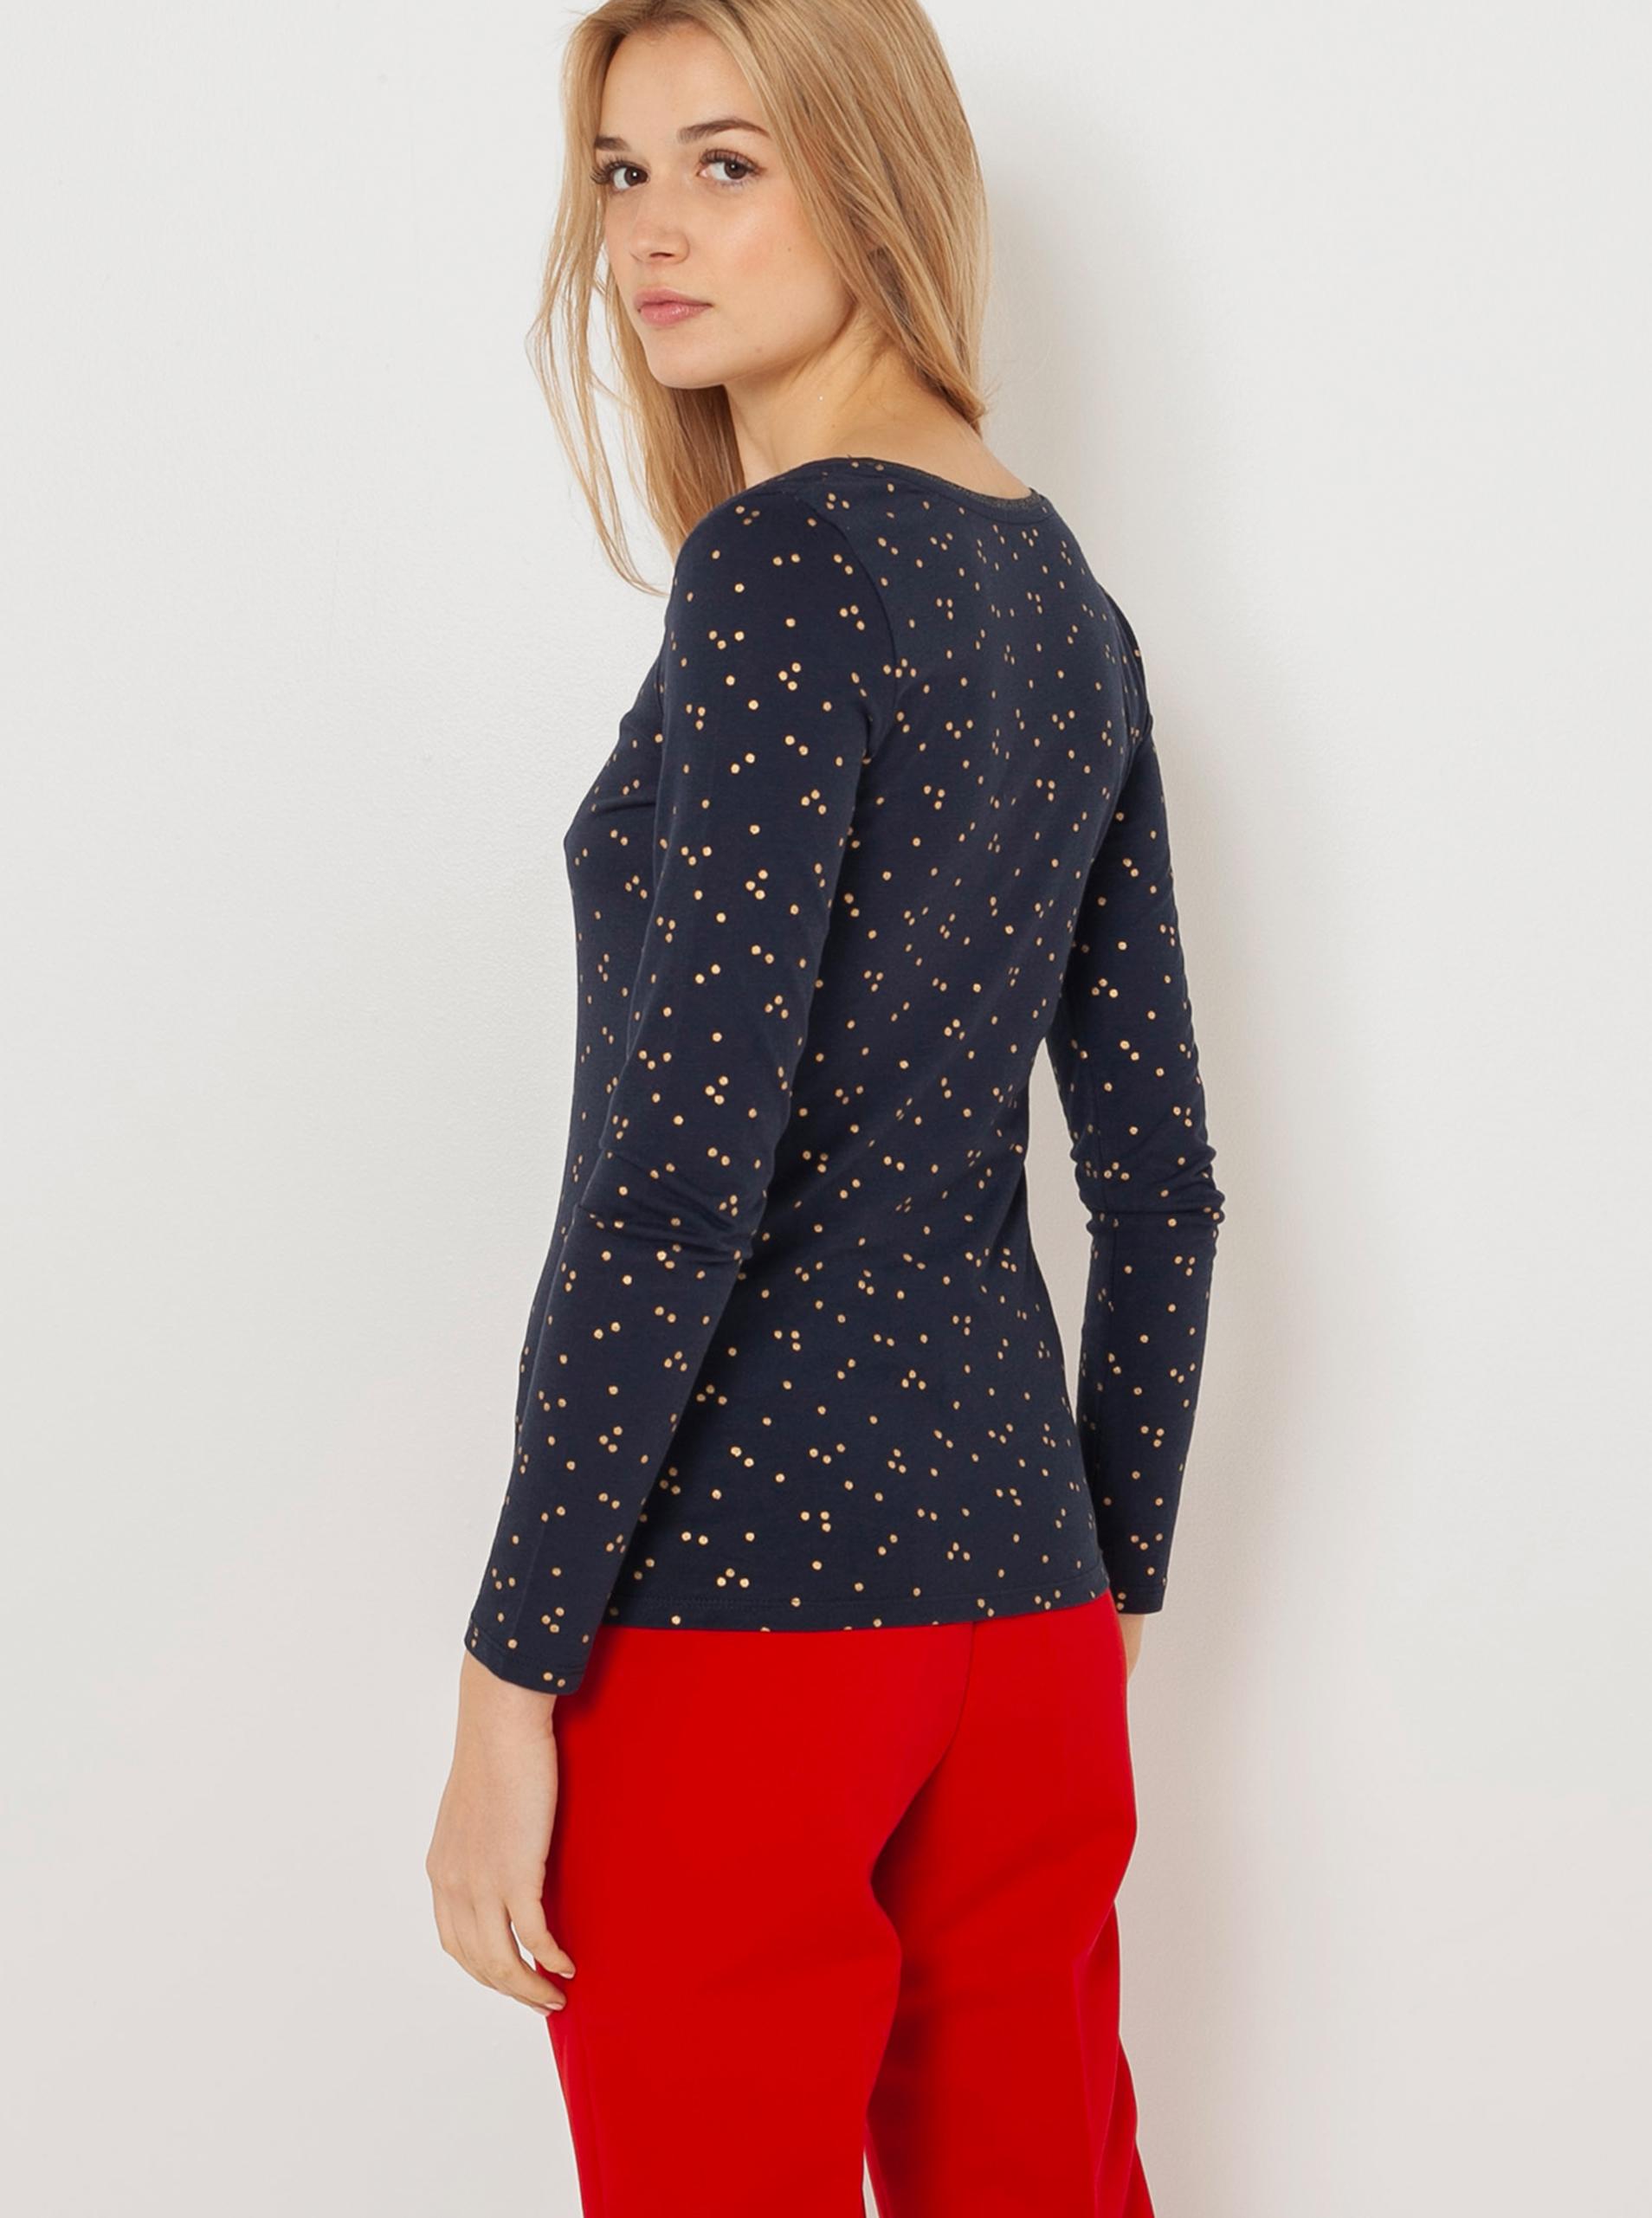 CAMAIEU blue T-shirt with pattern